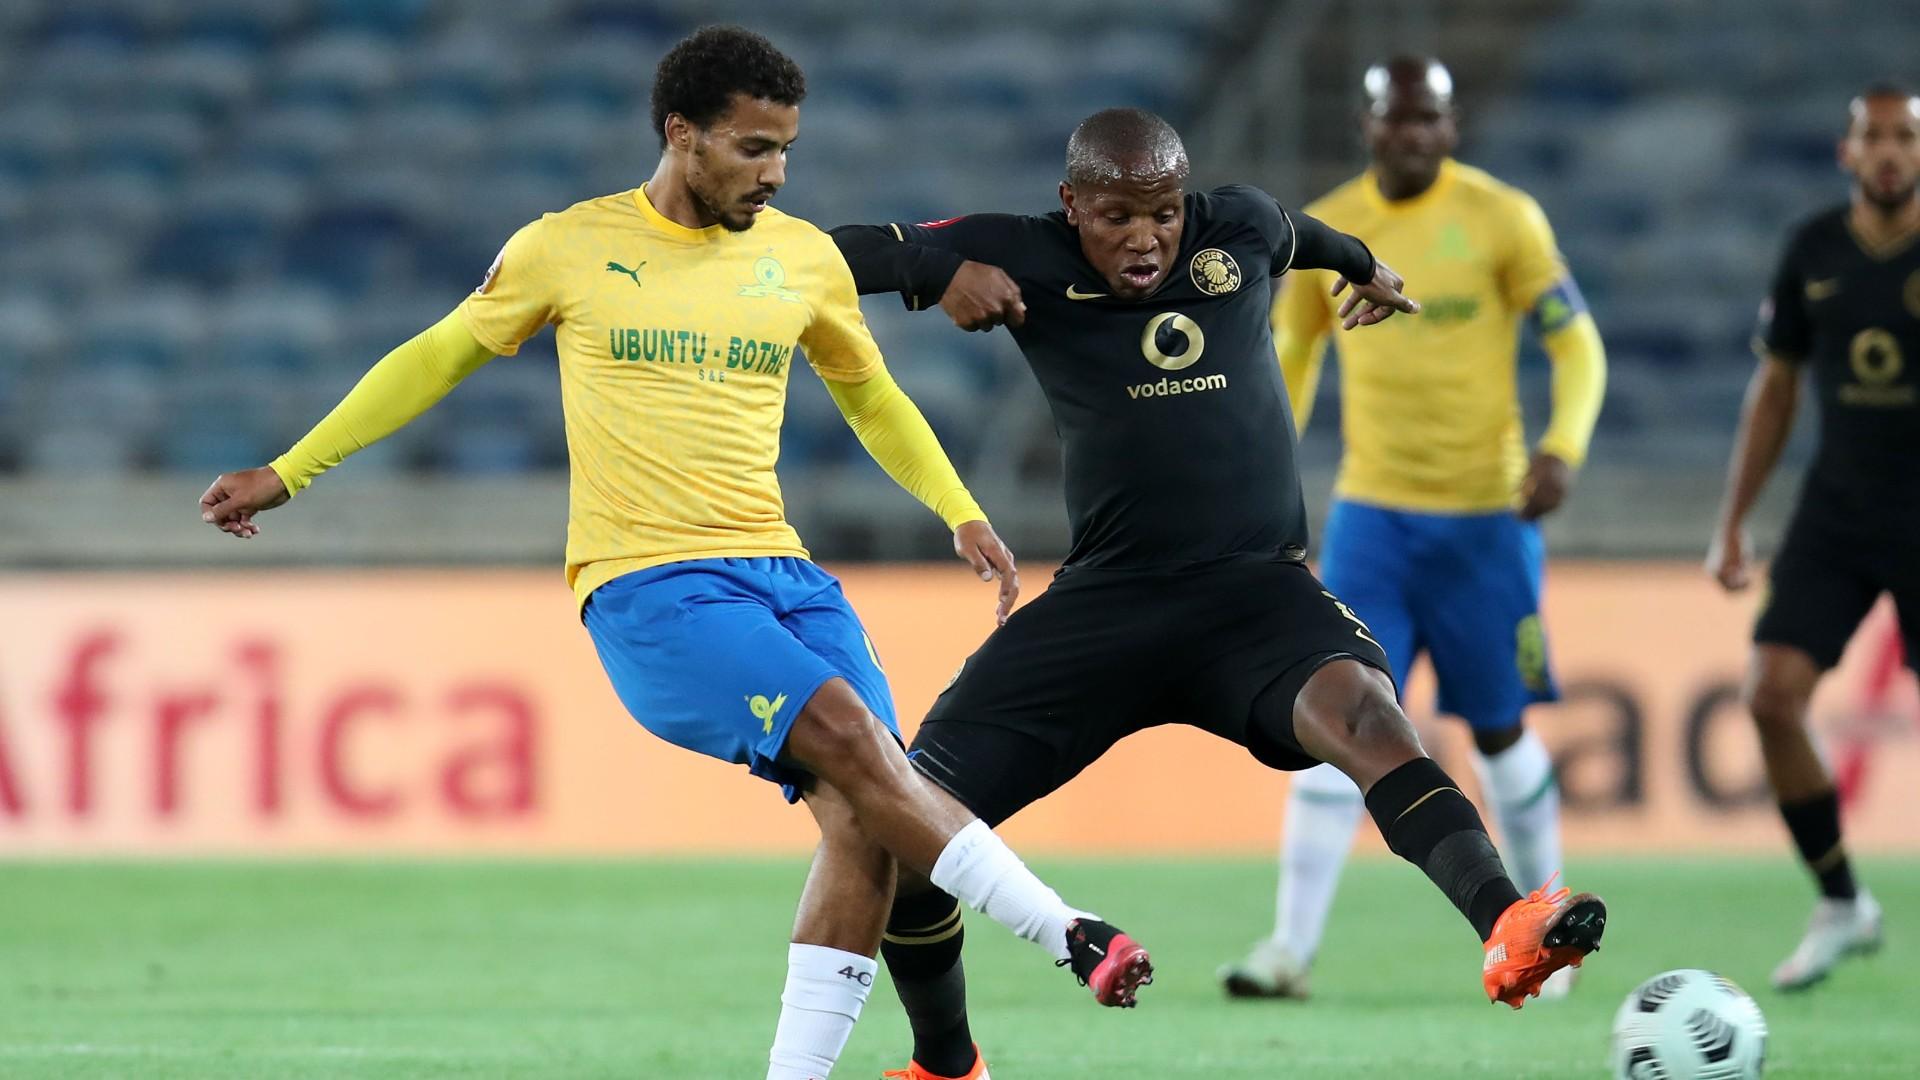 Kaizer Chiefs keen to erase disappointment with DStv Premiership title triumph – ex-Orlando Pirates striker Malokase